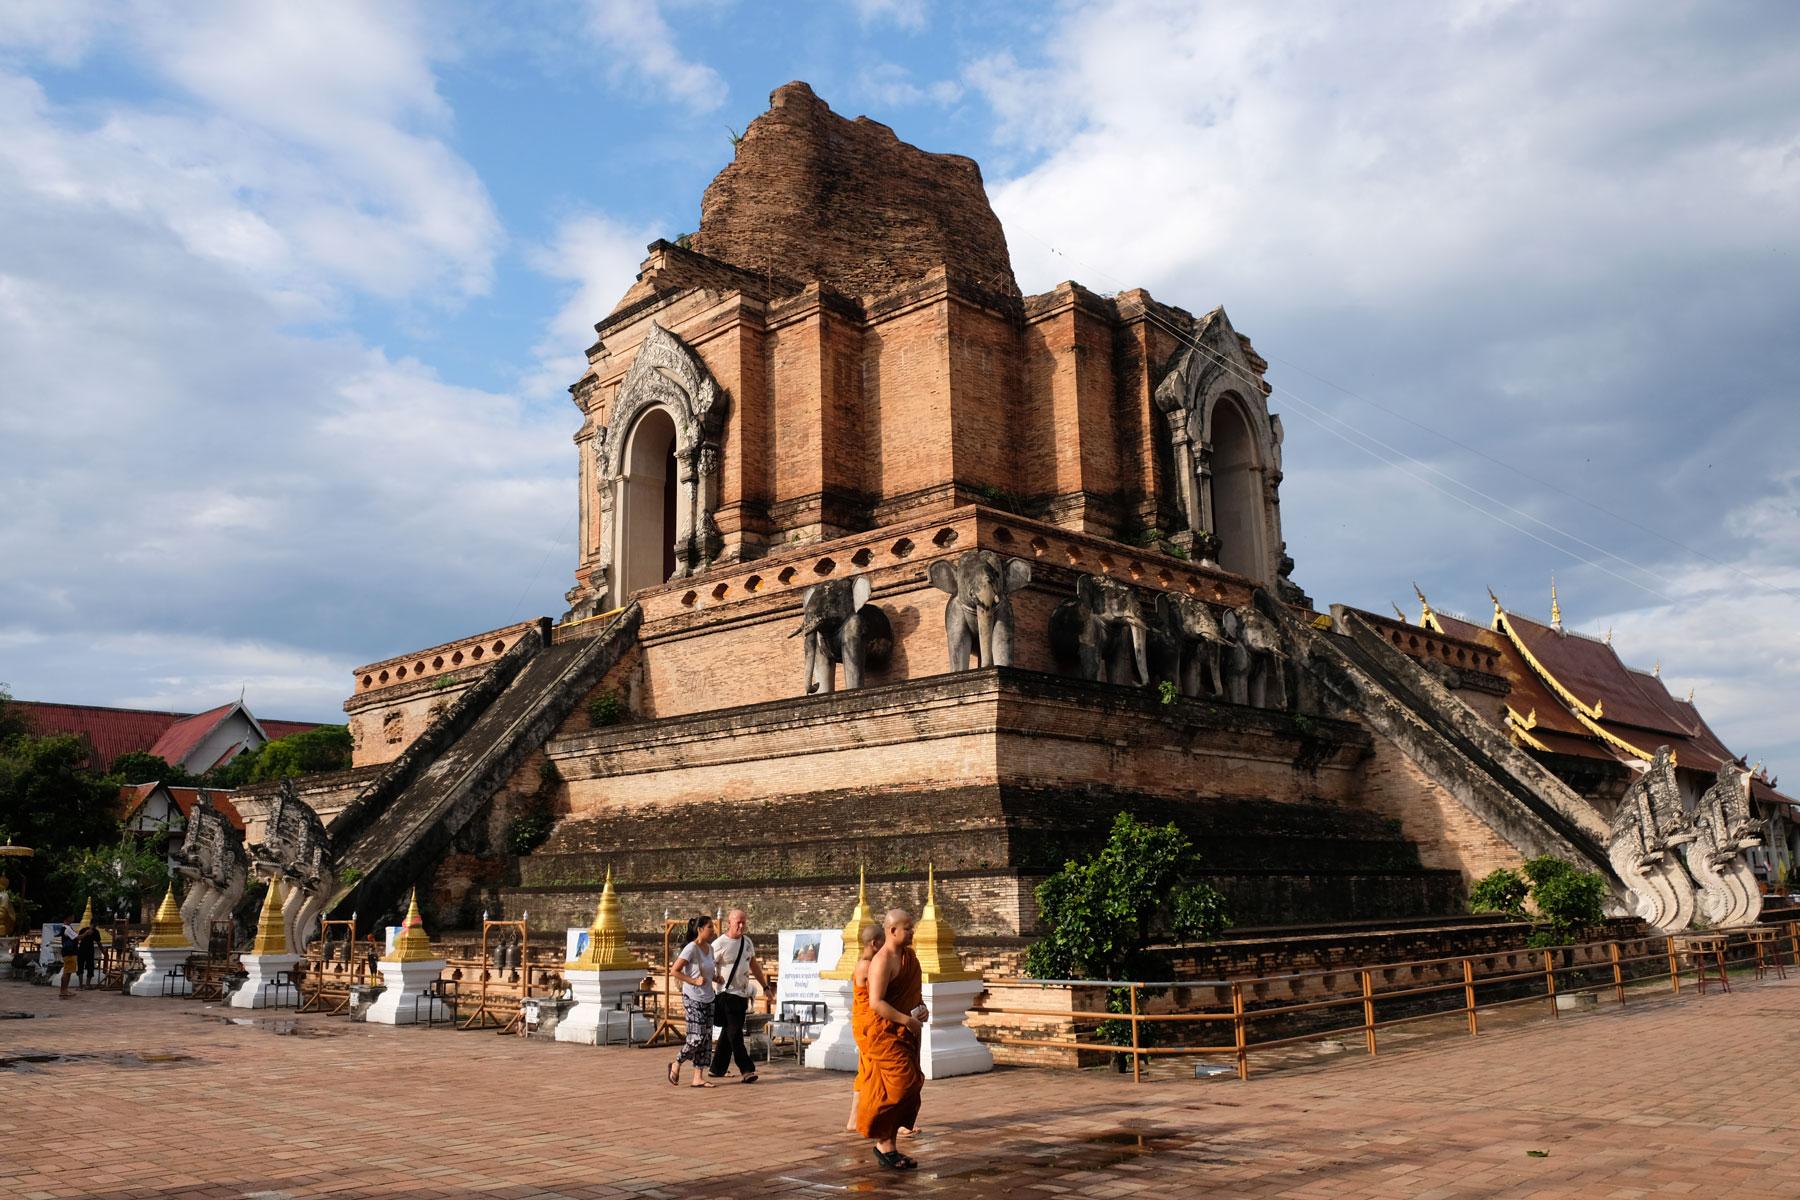 Buddhistische Mönche vor dem Wat Chedi Luang Tempel in Chiang Mai.